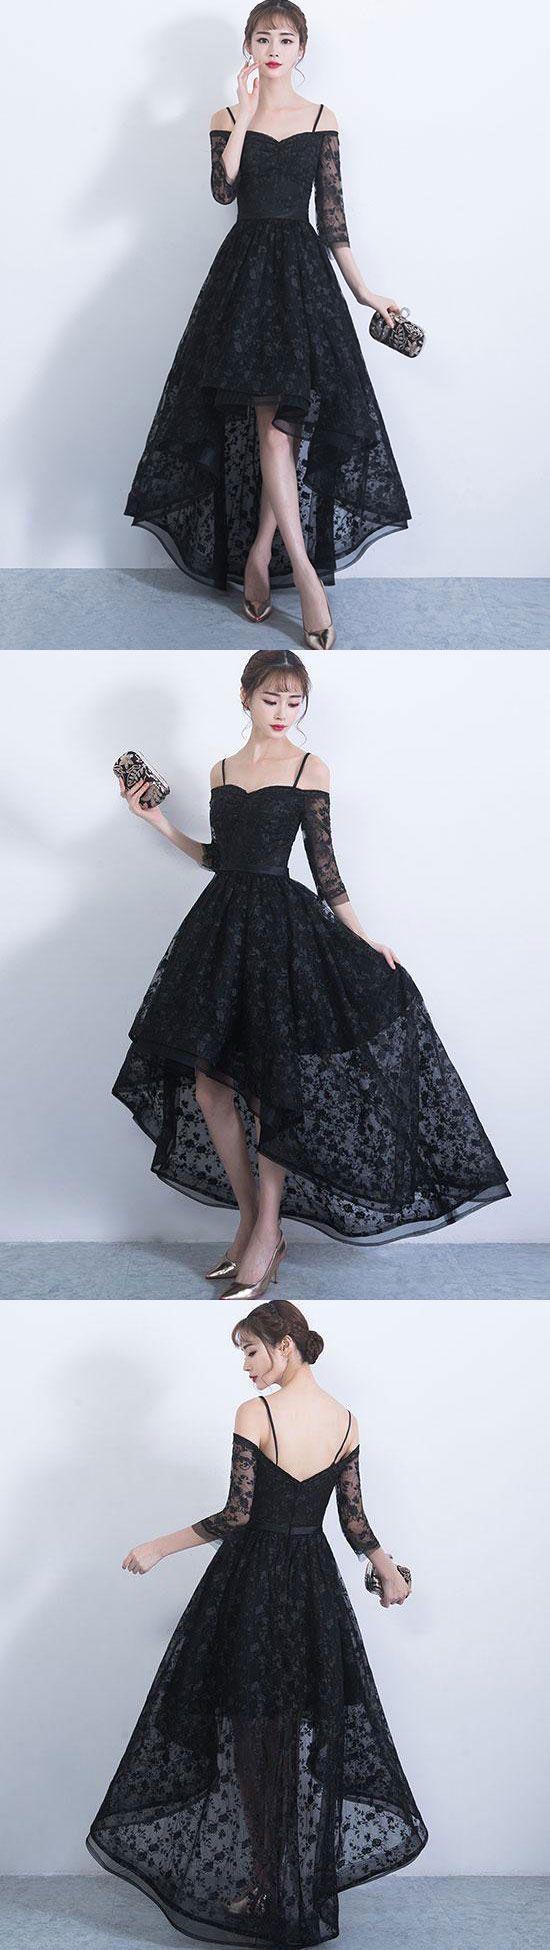 135a6b3586 Cheap High Low Prom Dresses | Saddha